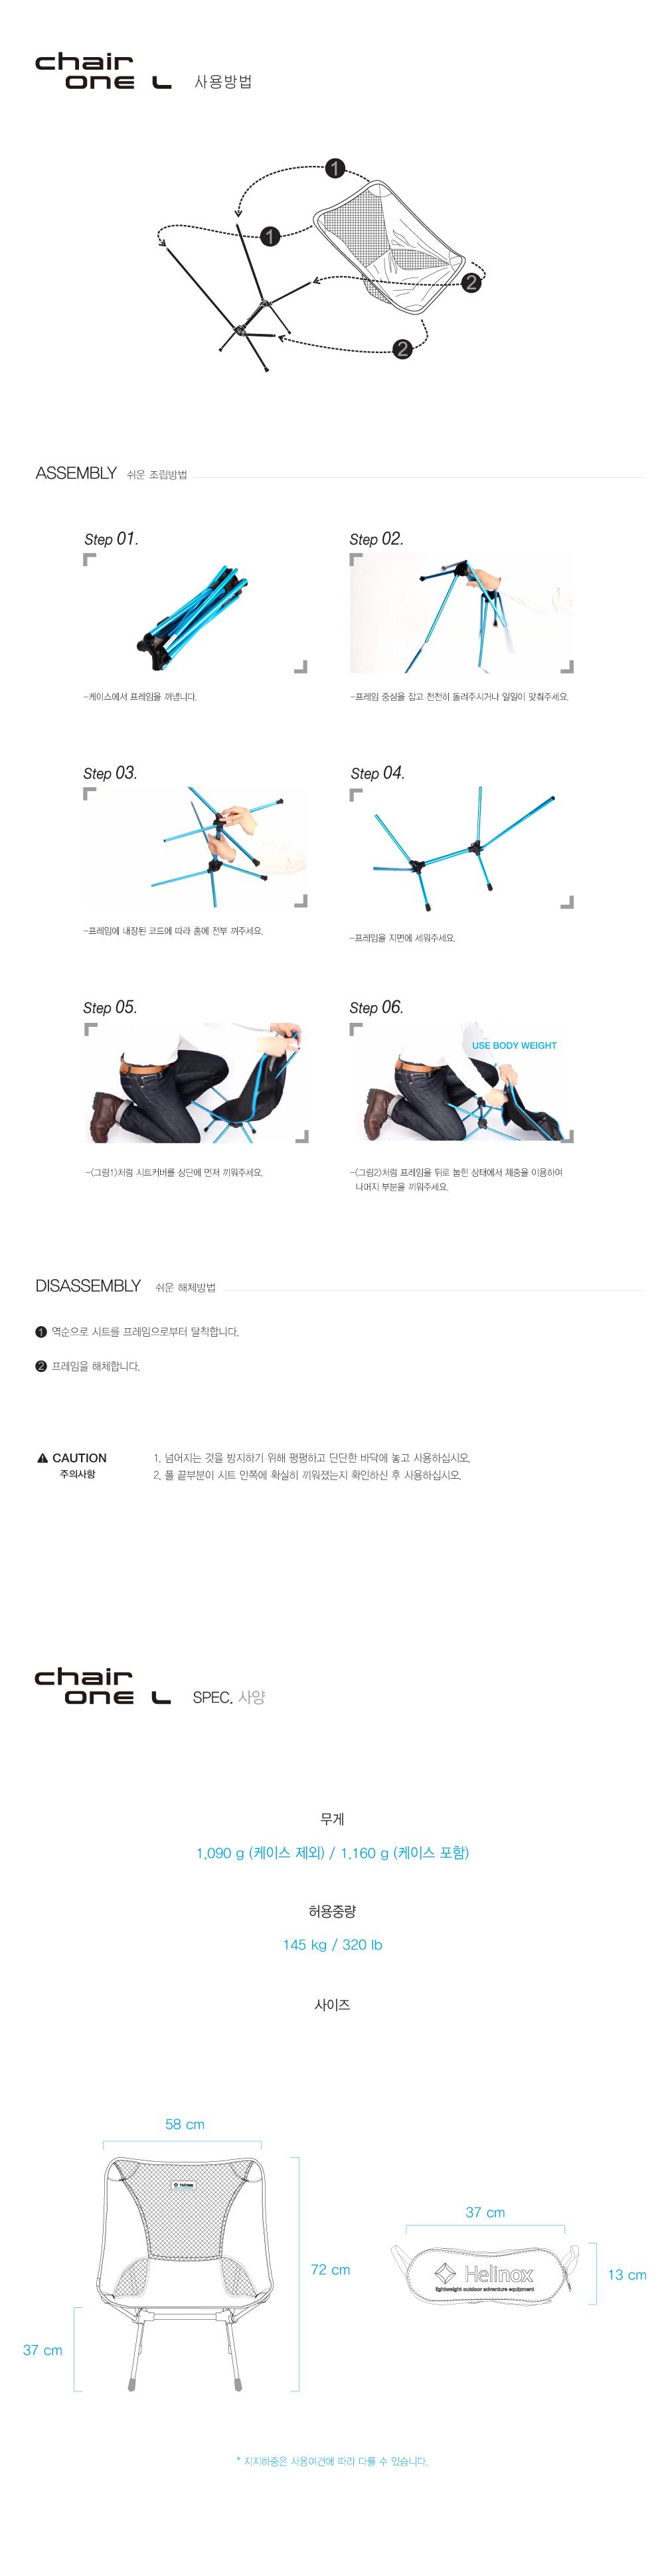 20180122-Helinox_chair-one_-L-red-상품페이지3.jpg